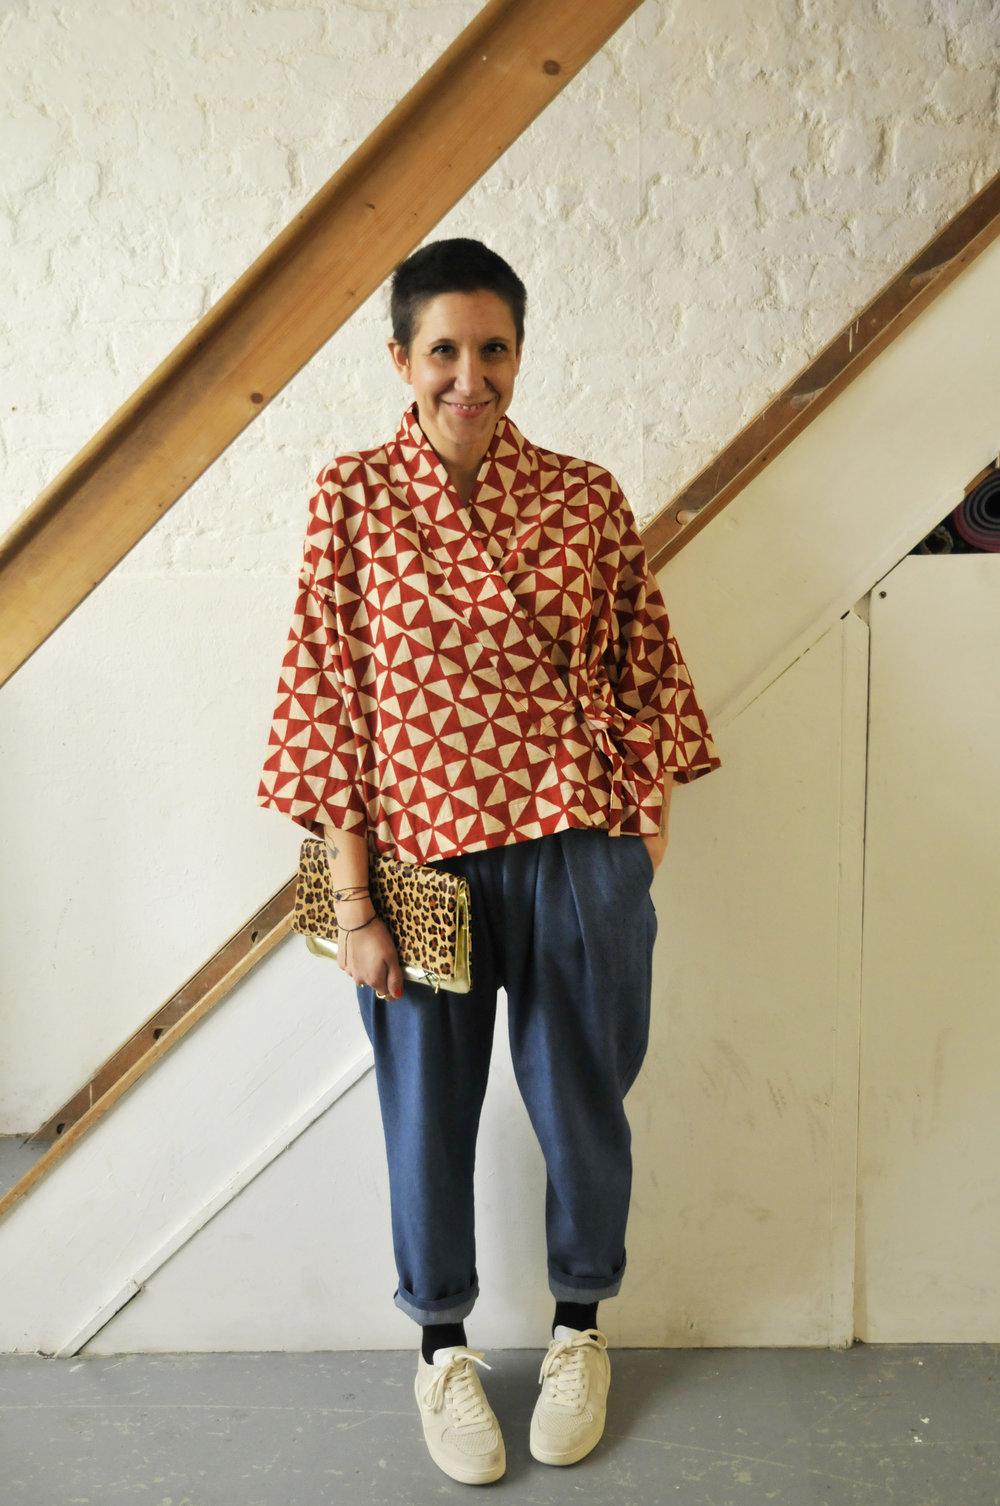 Olive Loves Alfie Kimono  Kelly Ekardt Denim Trousers  Veja Trainers